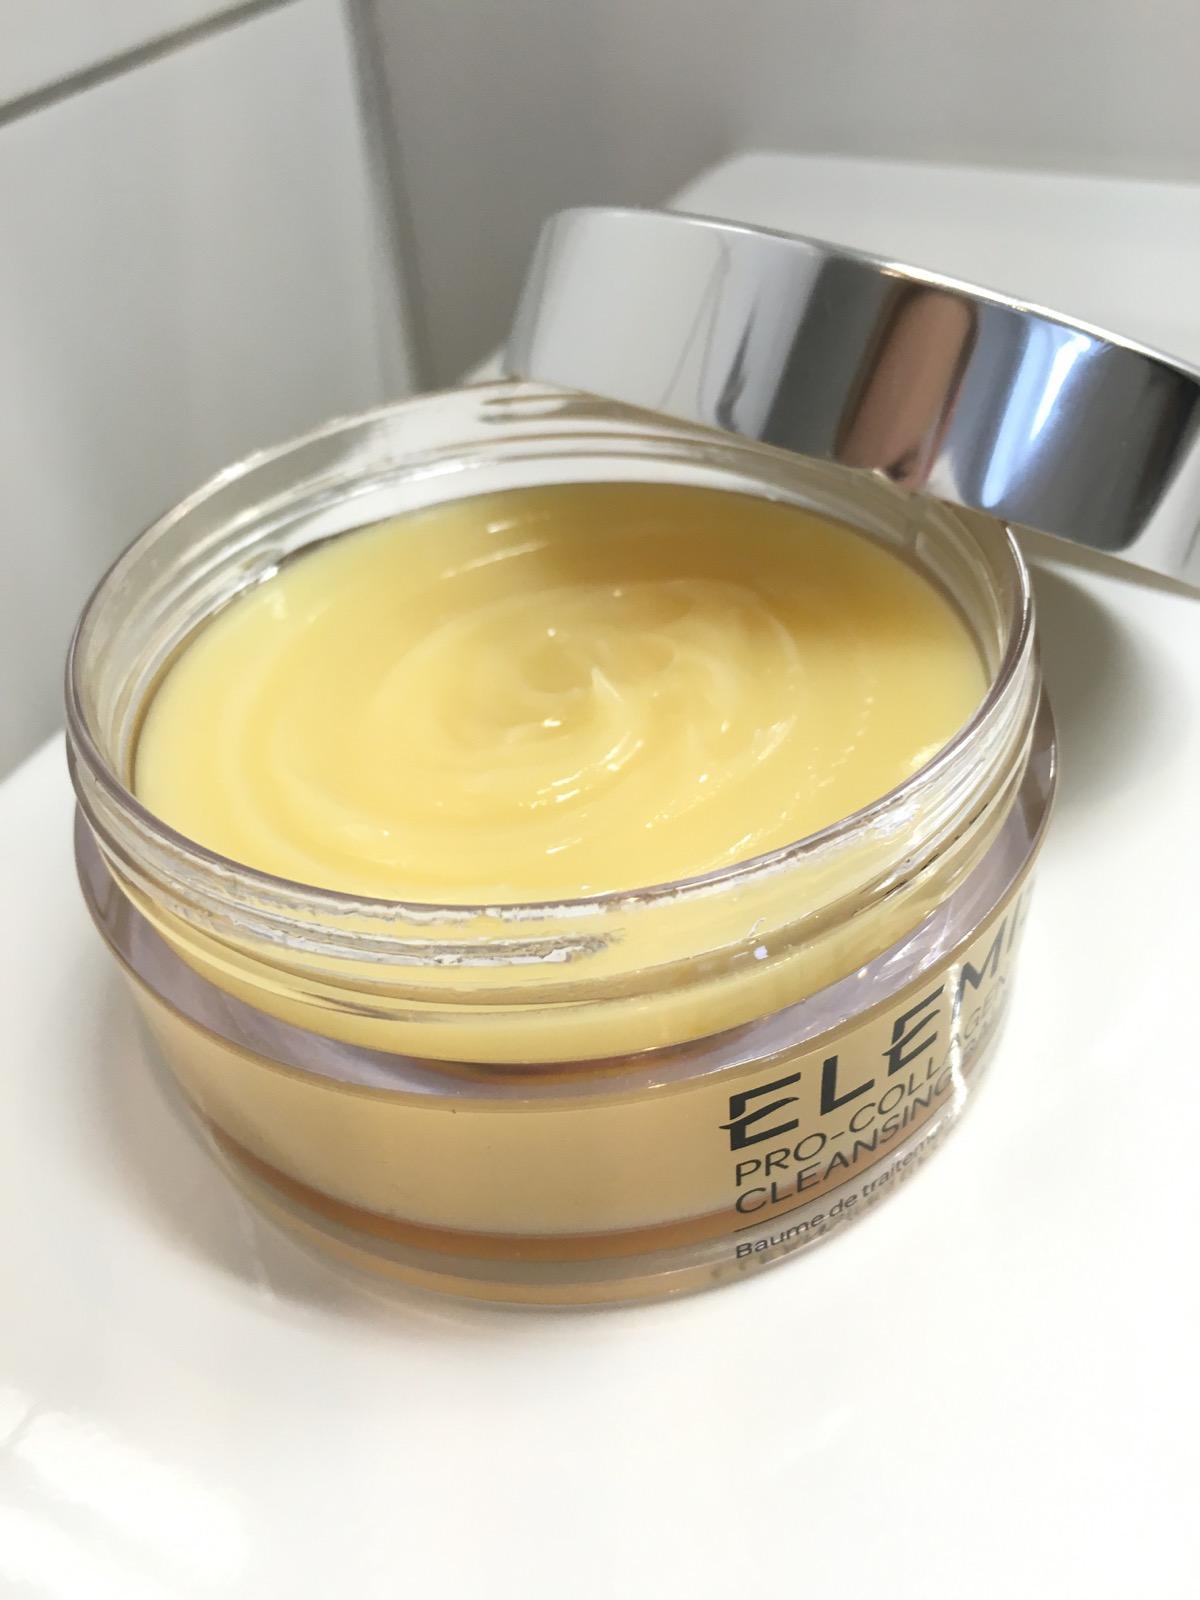 Elemis Pro-Collagen Cleansing Balm | skonhetssnack.se